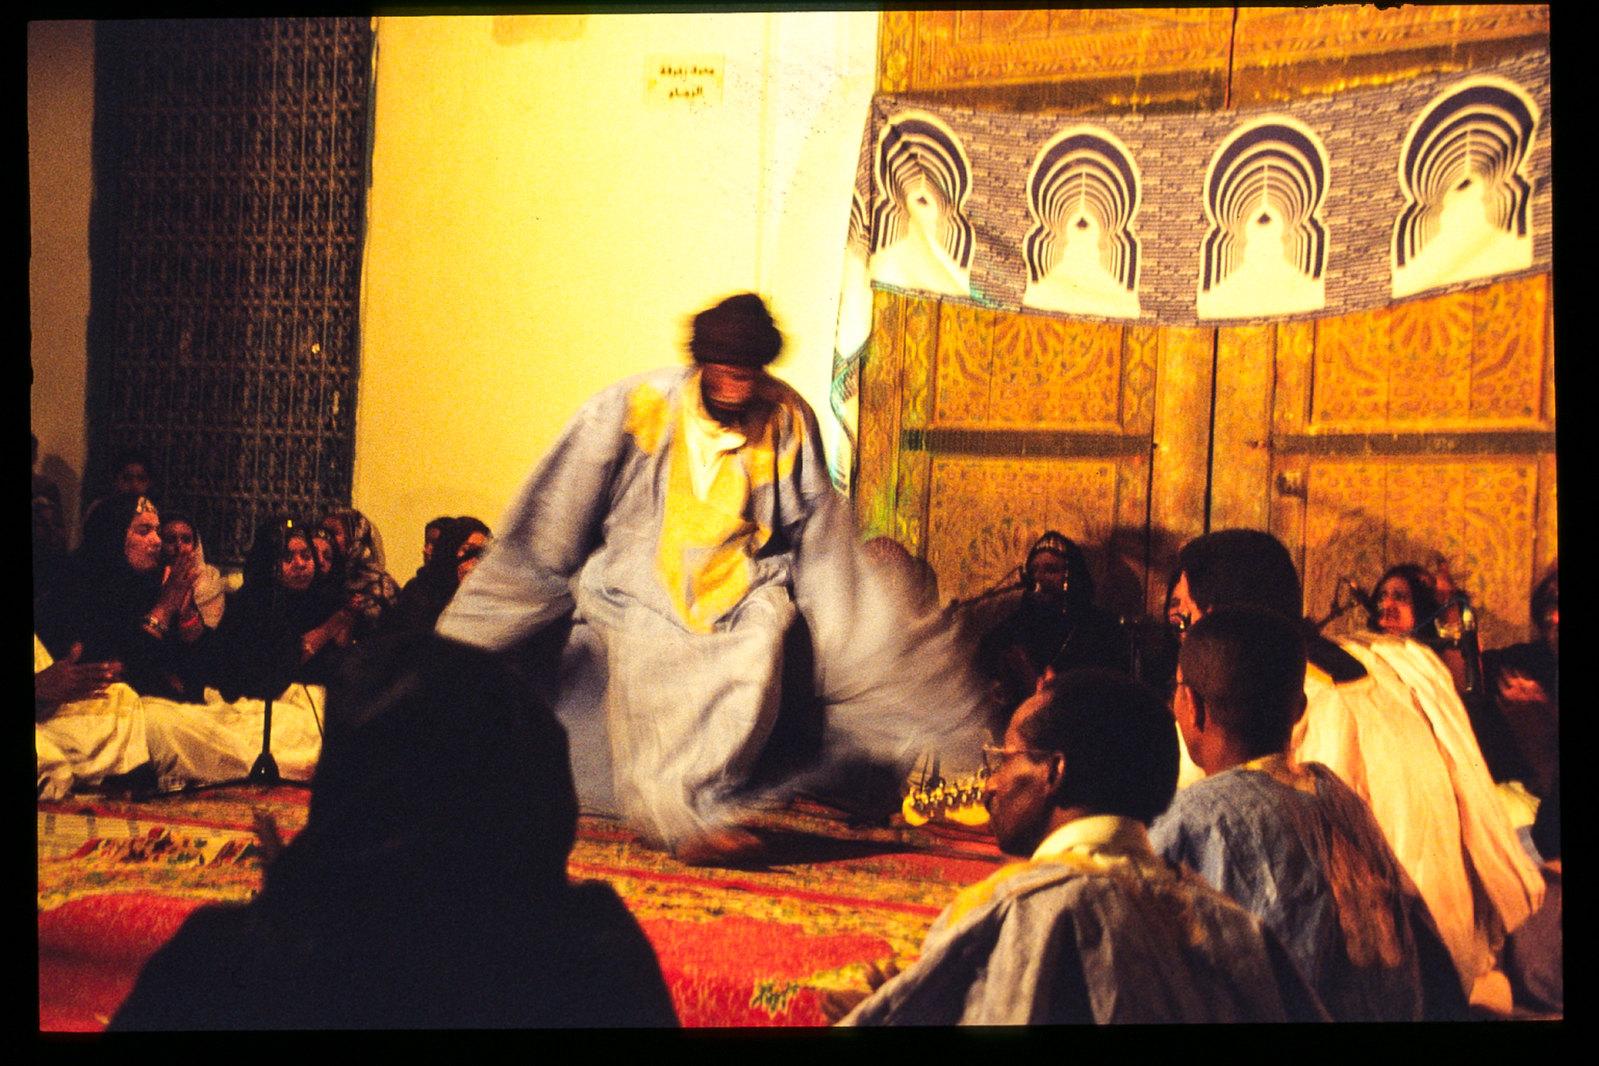 Festival de musique de Fes - Concert Sahraoui à Dar el Moqri